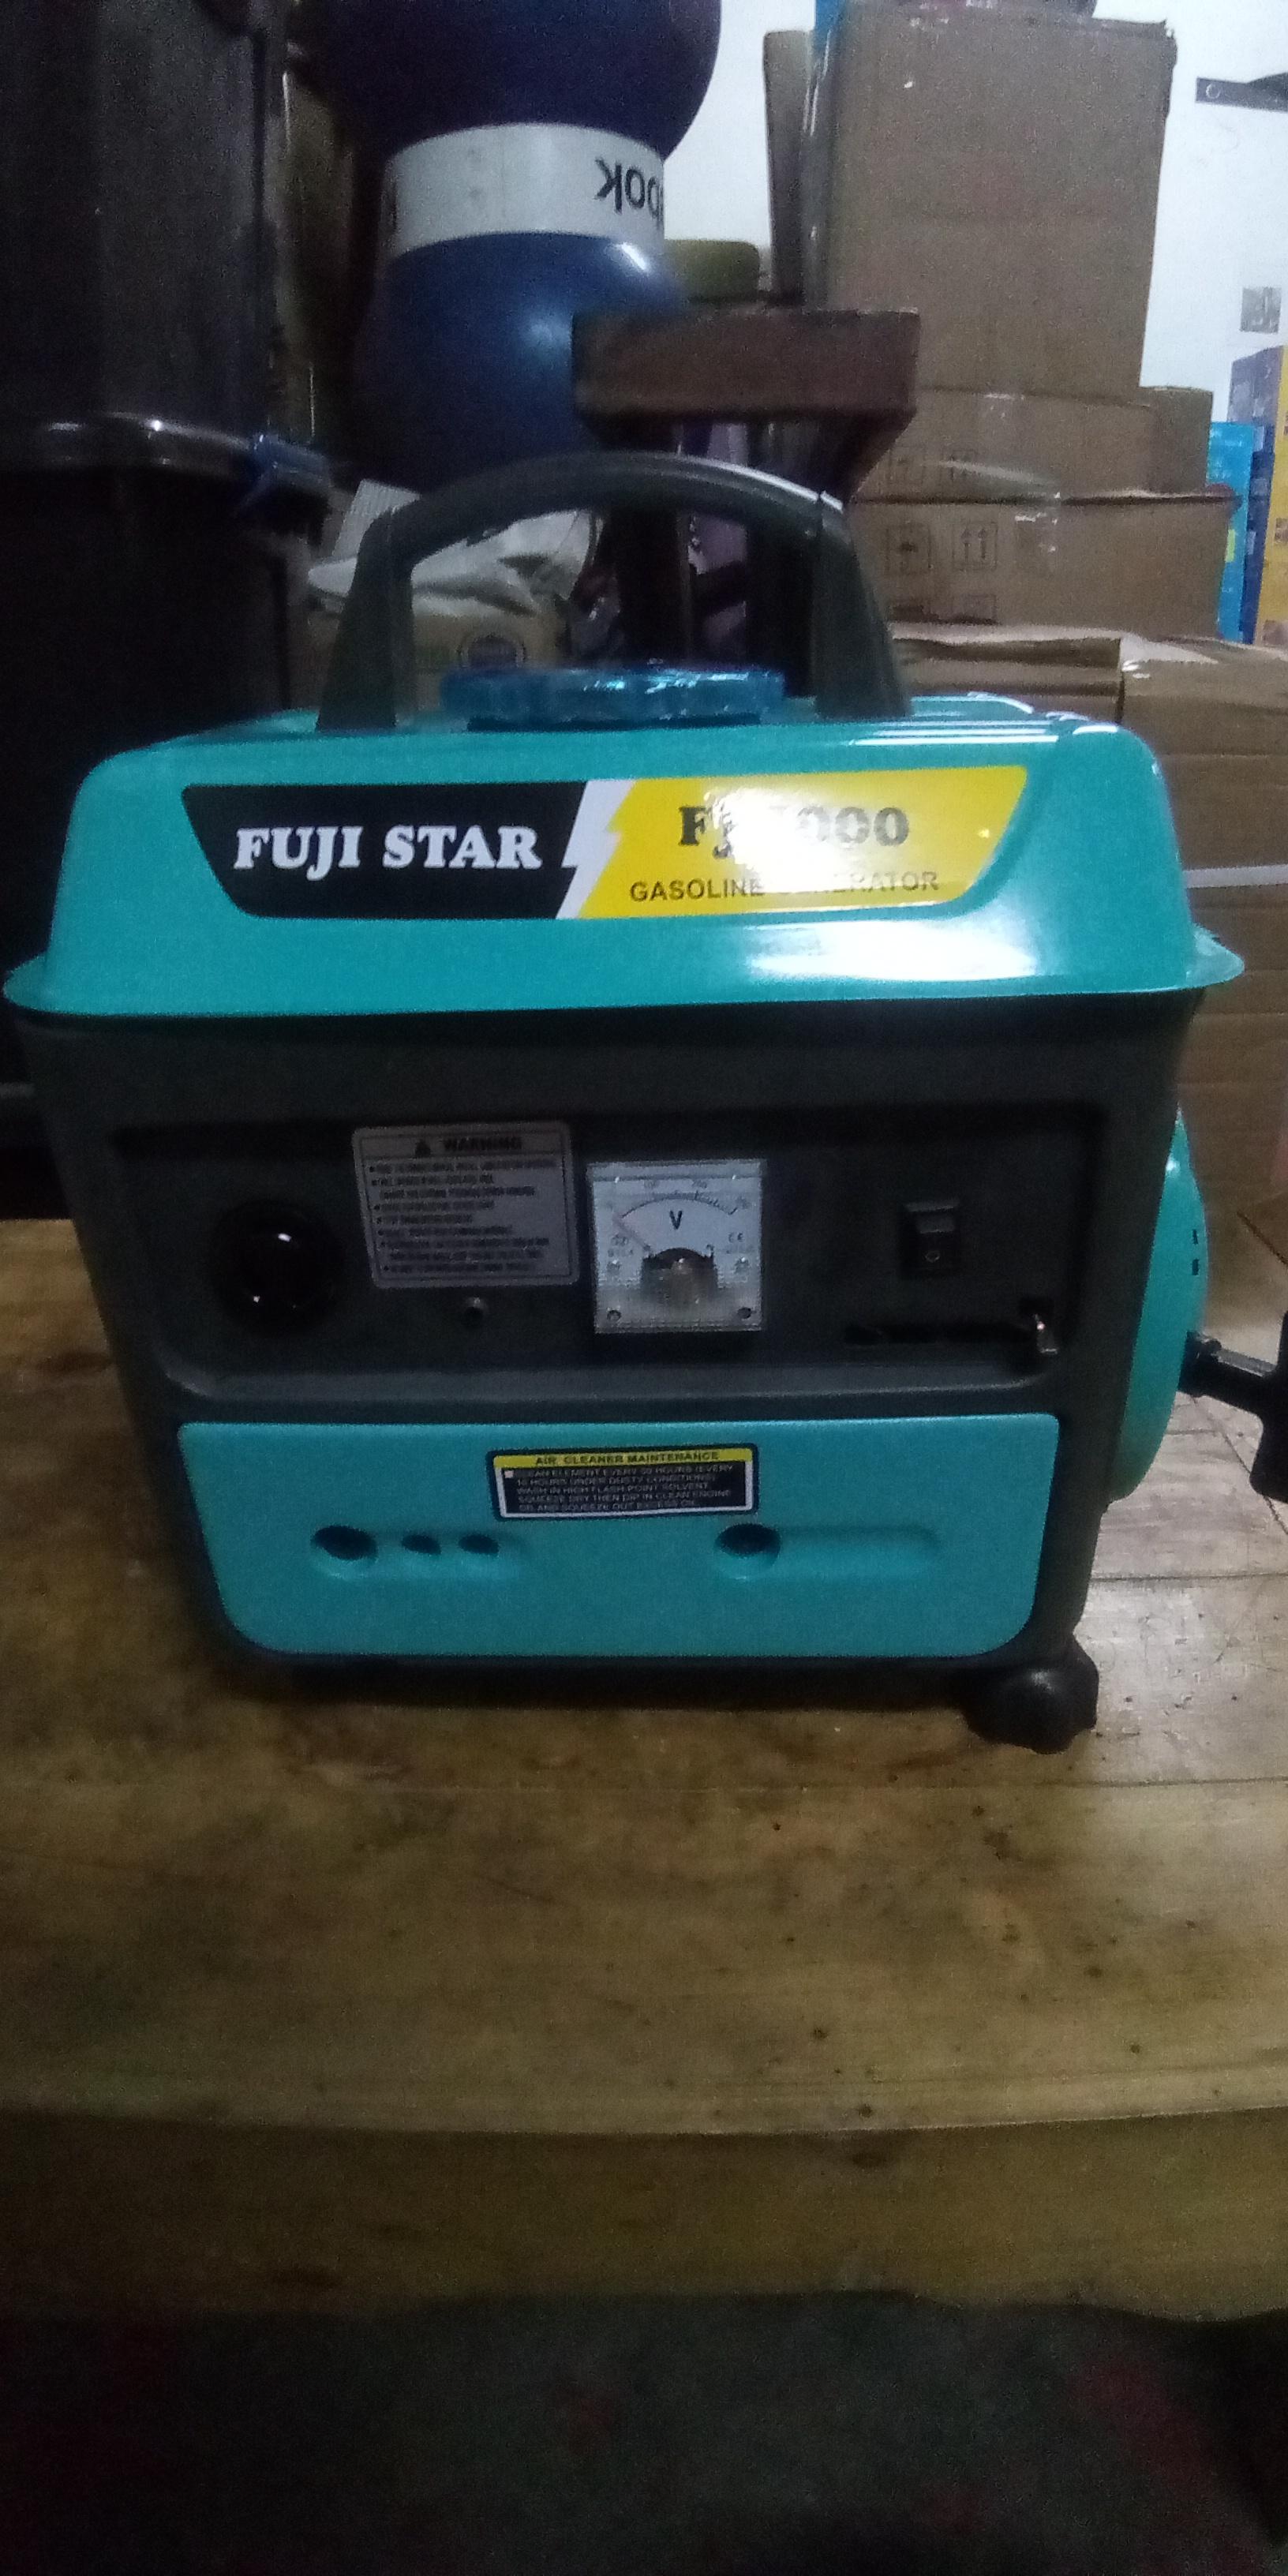 Fuji Star FJ-1000 Gasoline Generator (100% Copper)